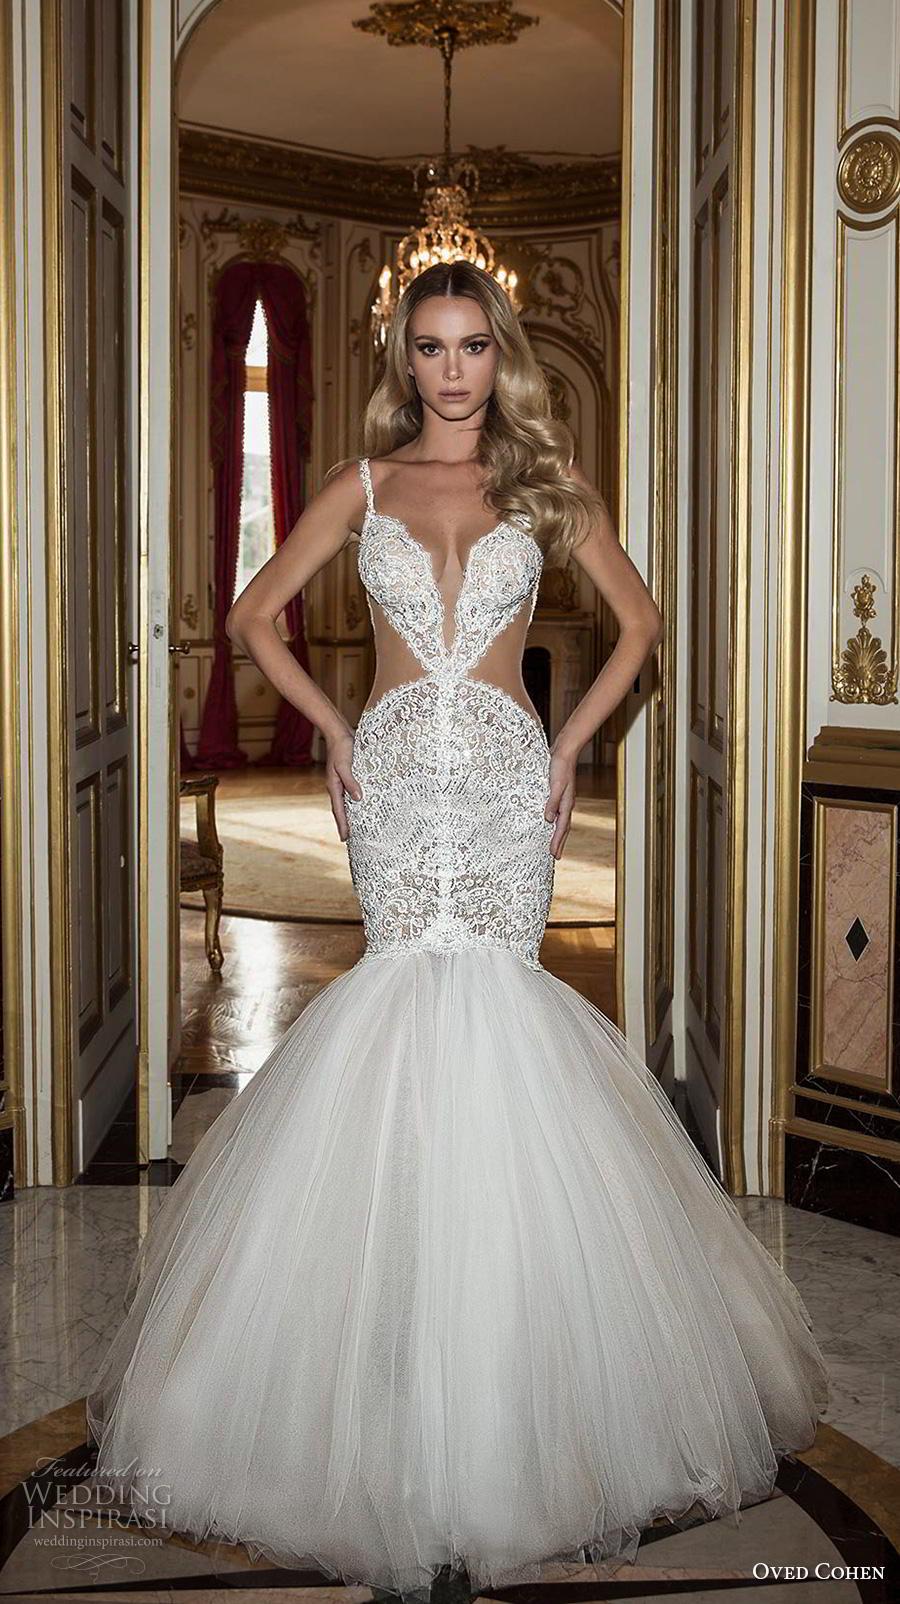 oved cohen 2018 bridal thin strap deep plunging sweetheart neckline full embellishment sexy glamorous mermaid wedding dress (10) mv